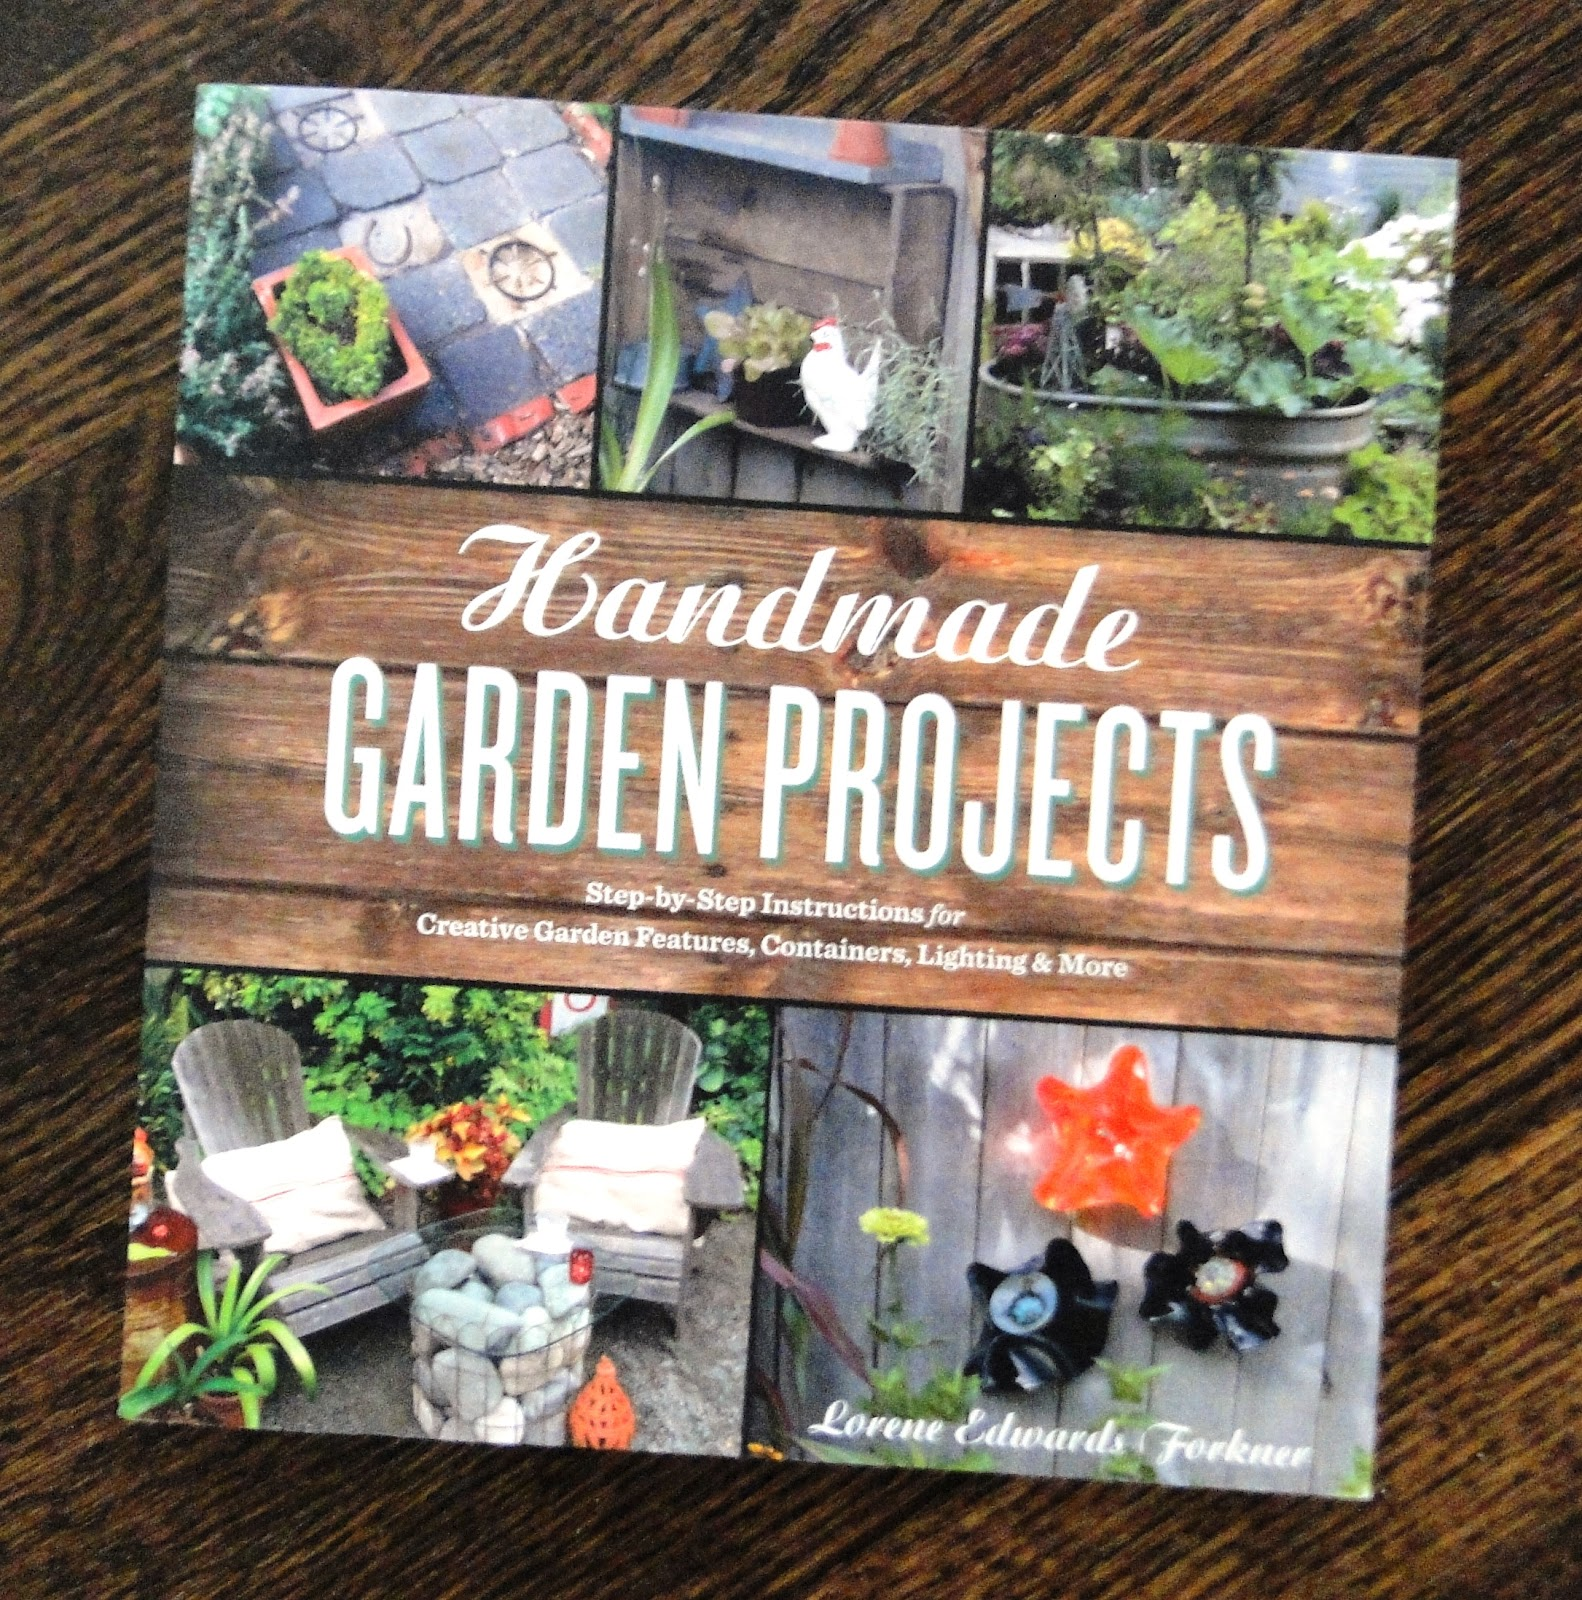 garden project ideas diy garden projects roundup garden diy projects